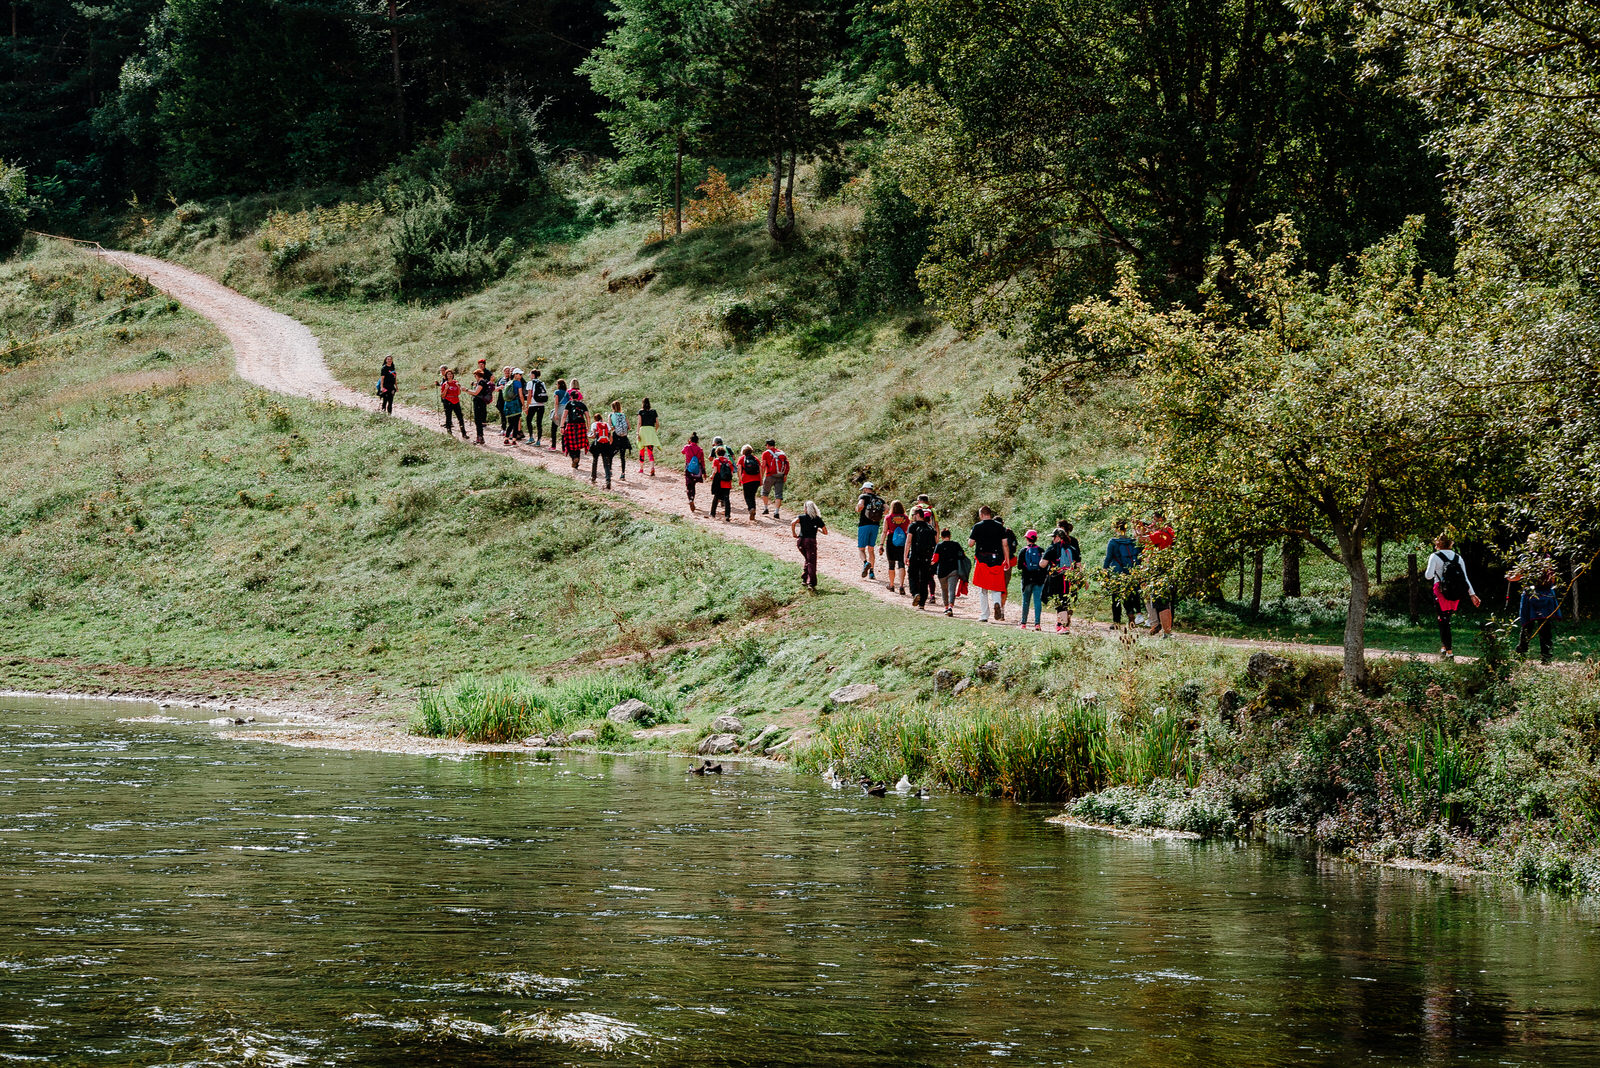 PHOTOS: Over 1,000 people take part in Croatian Walking